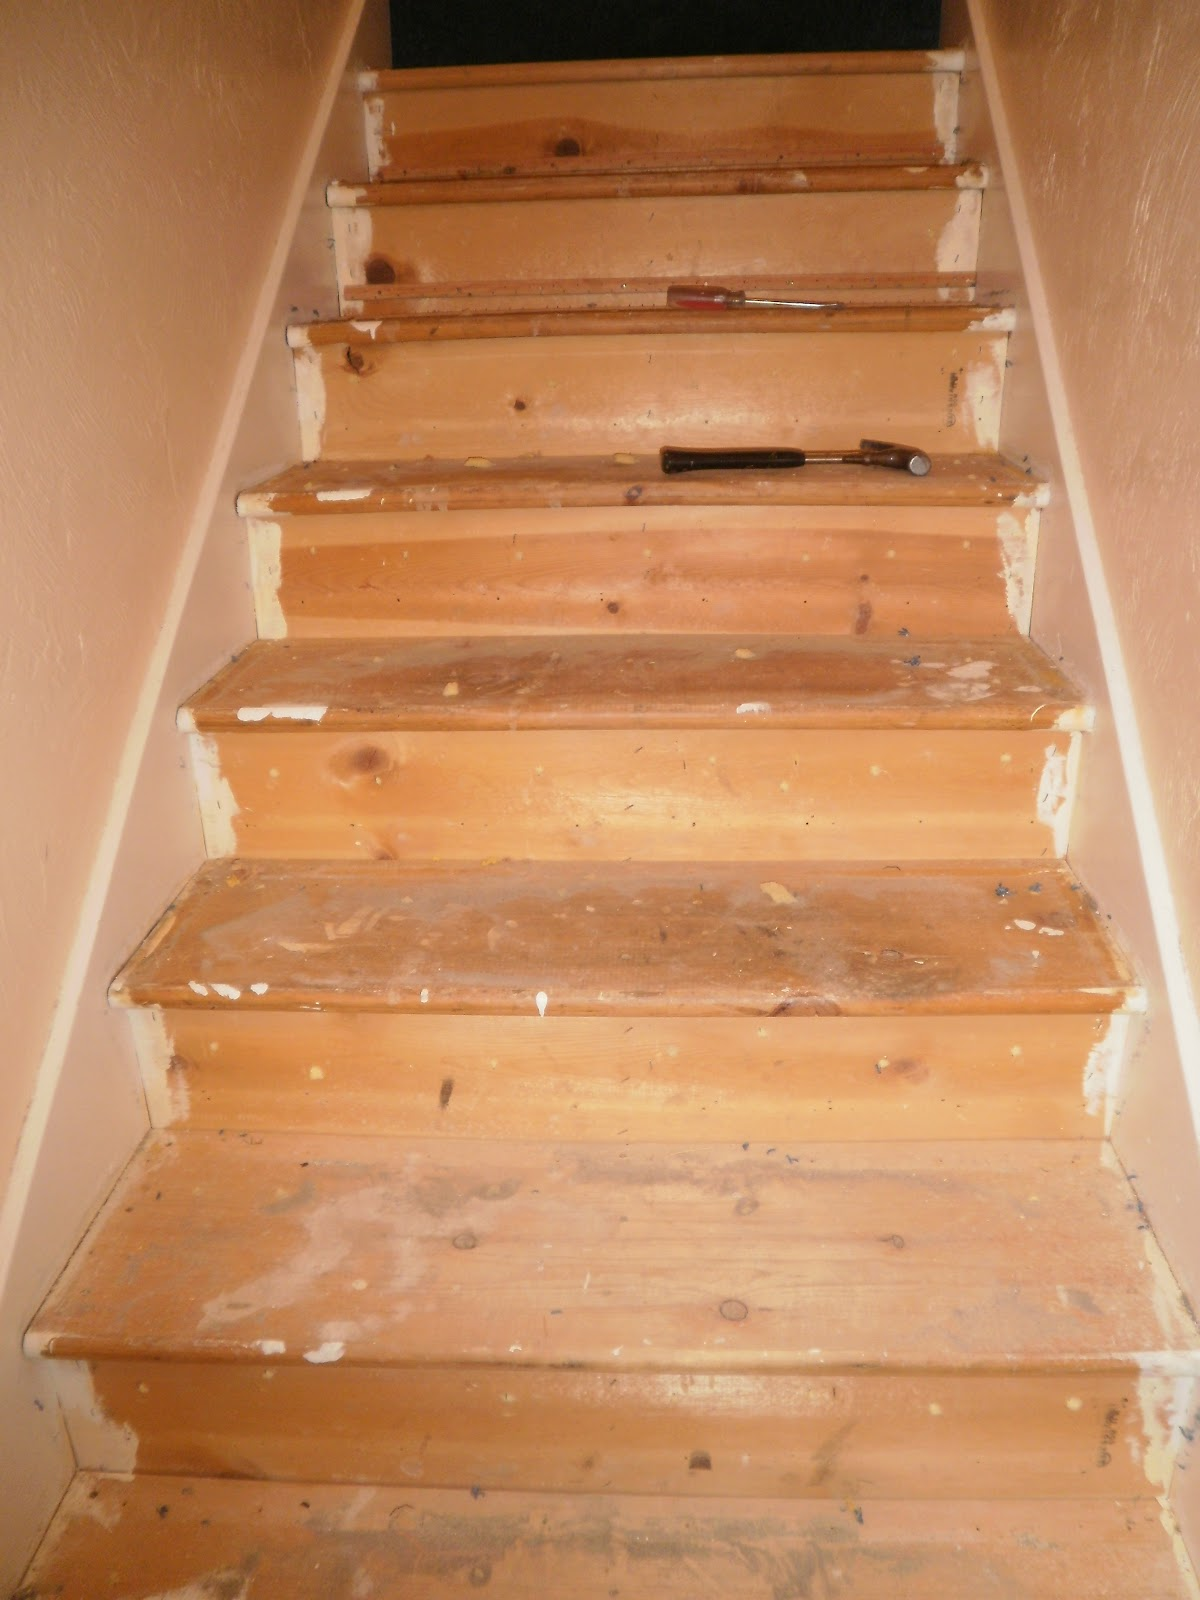 http://1.bp.blogspot.com/-PU0v1z84fNc/Tnz_-OyNG6I/AAAAAAAAAGo/UsUptuzf2ls/s1600/house+fix+up+001.JPG